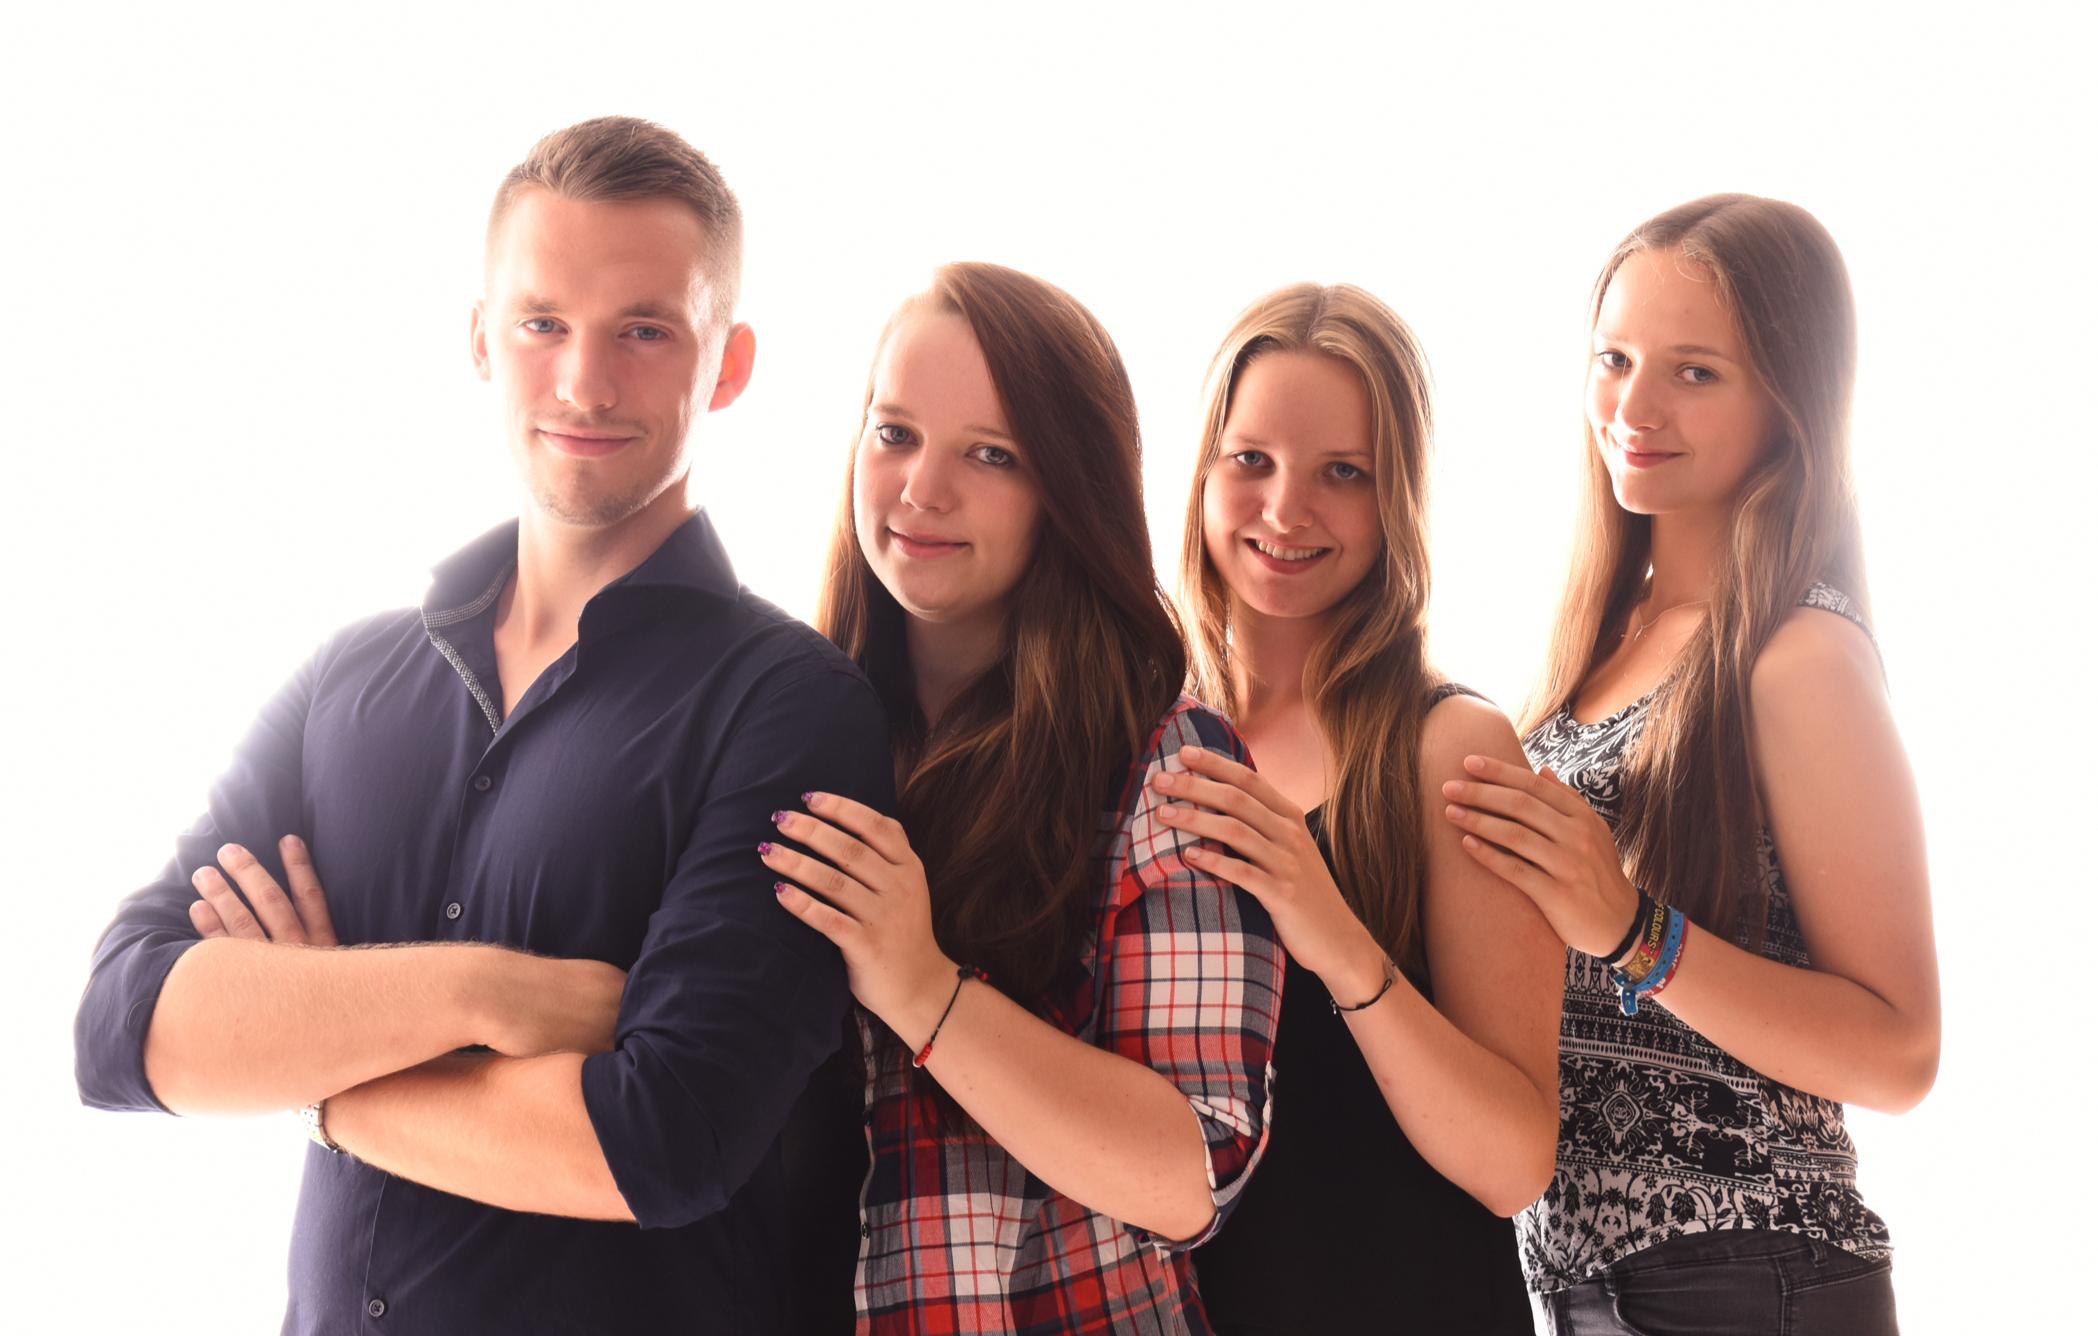 familienshooting-goerlitz-bg5